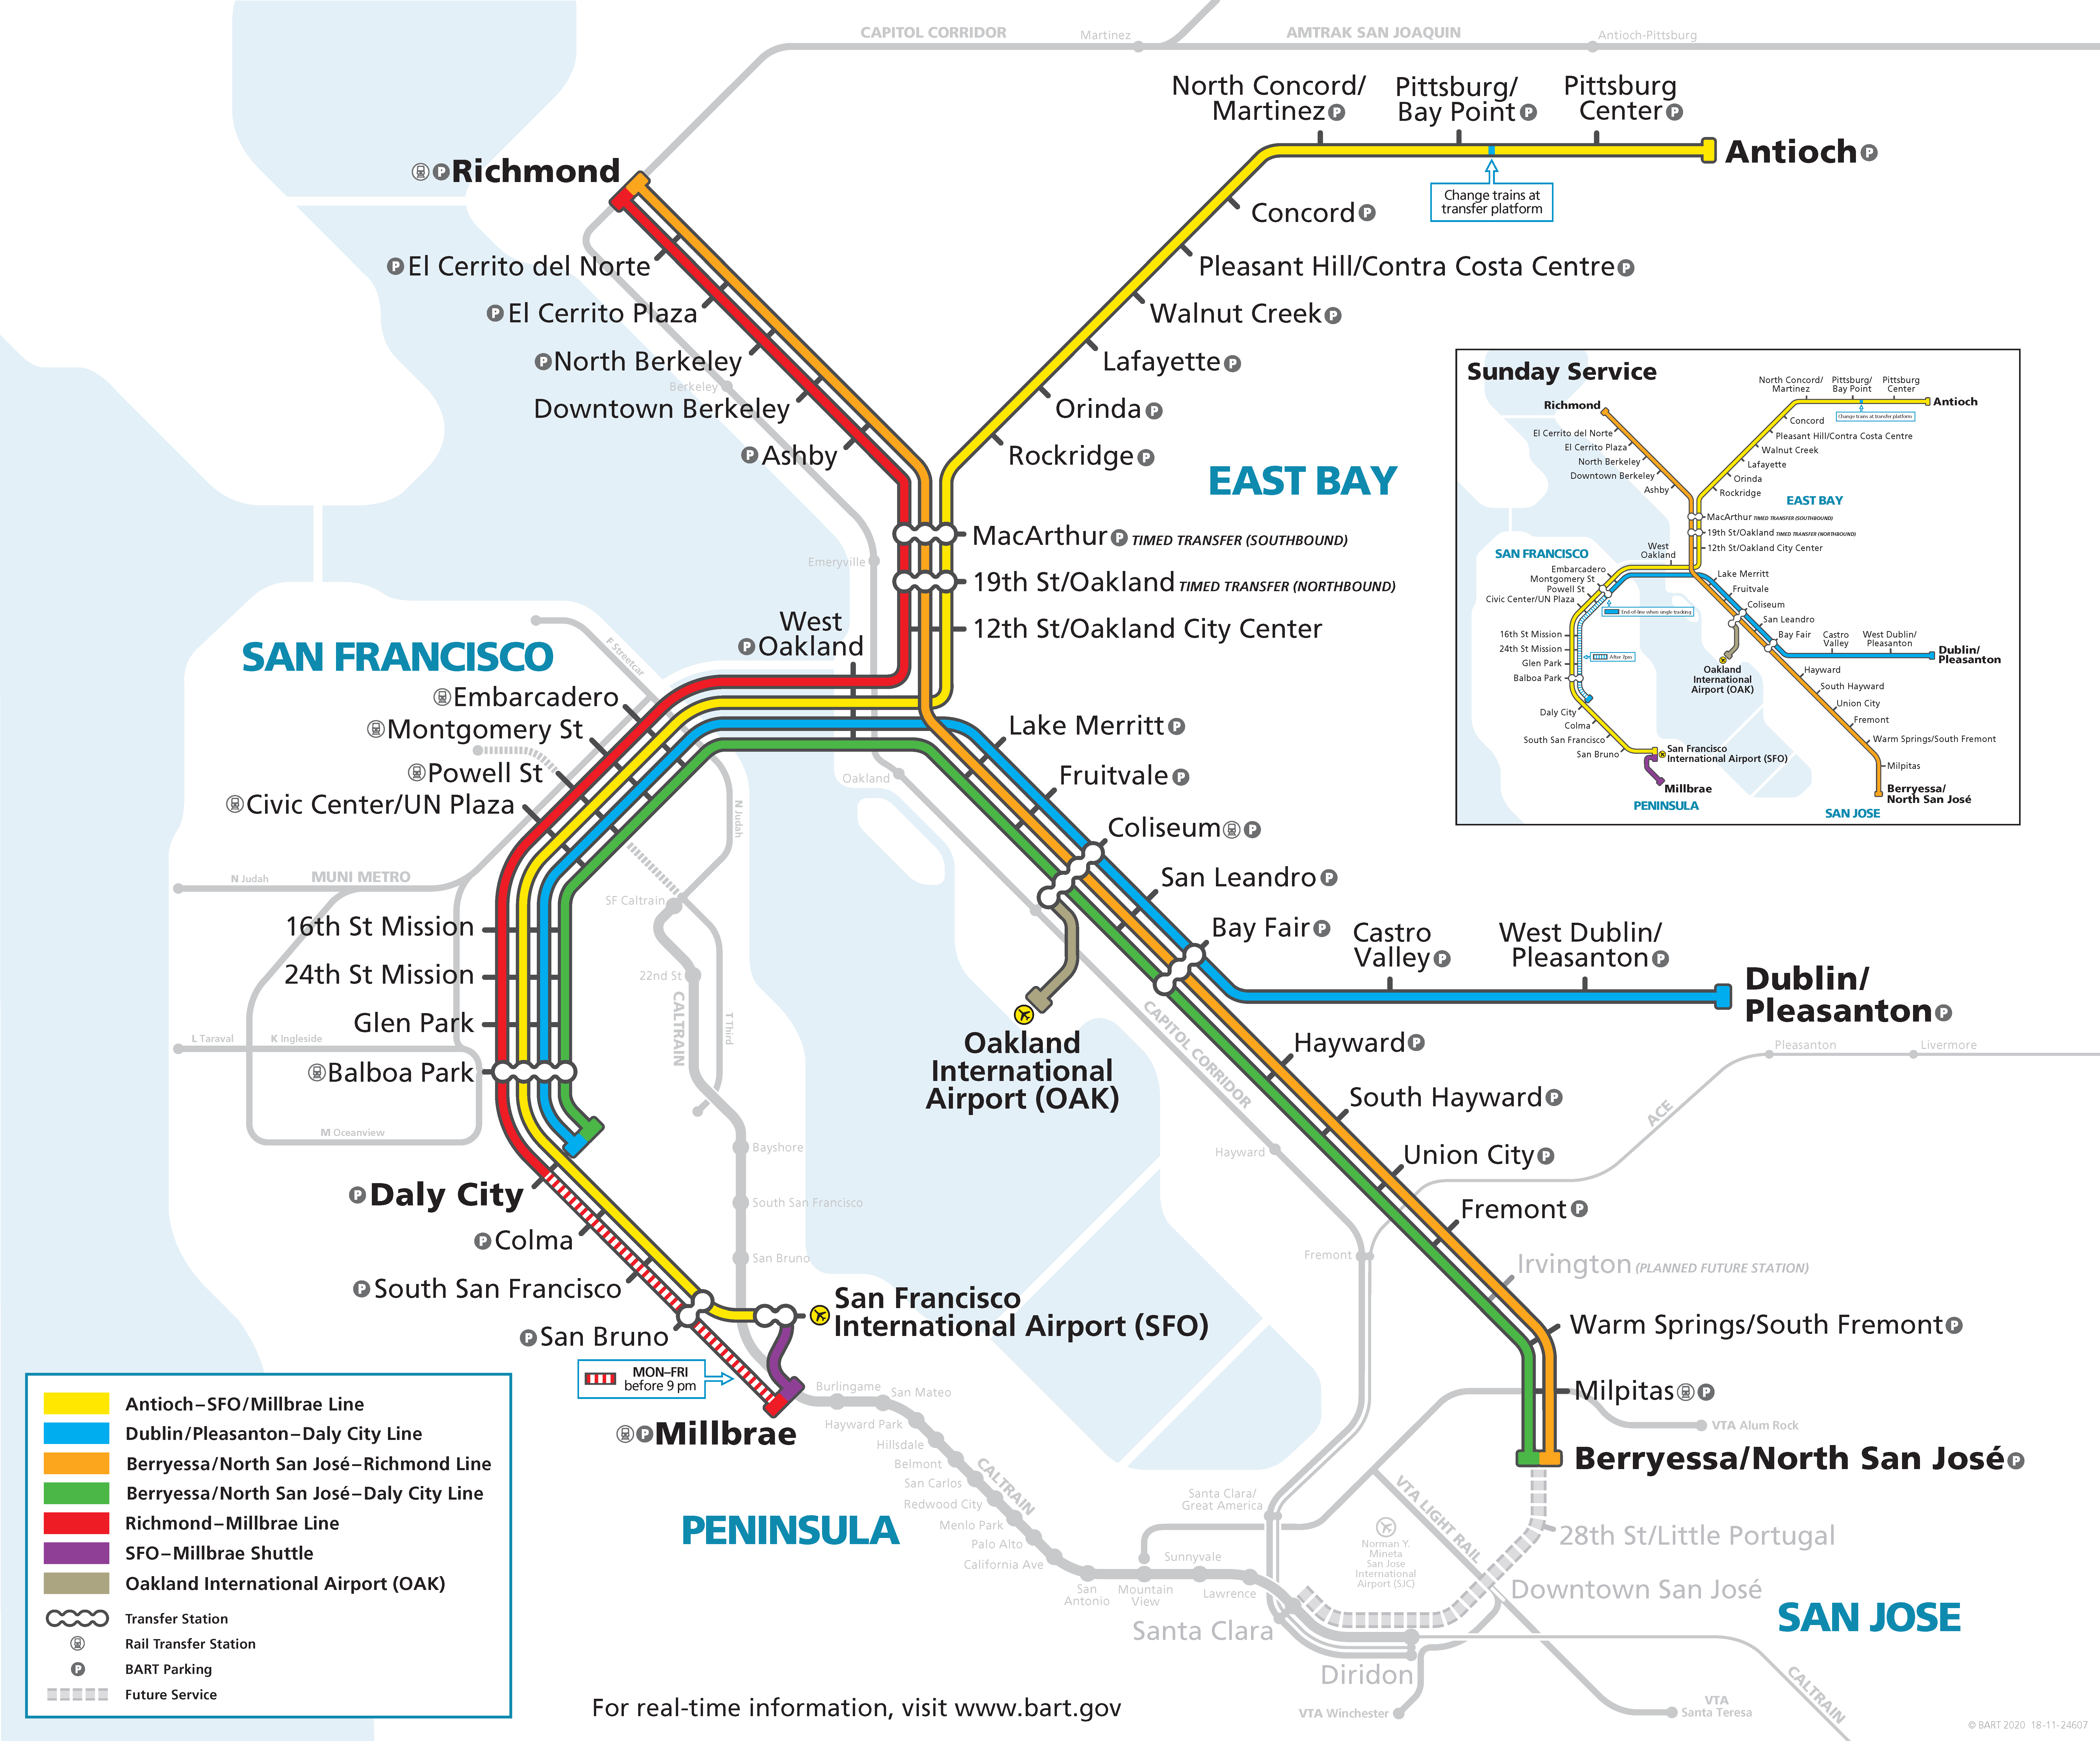 Bay Area Rail Transit Maps By Calurbanist Jump to navigation jump to search. transit maps by calurbanist